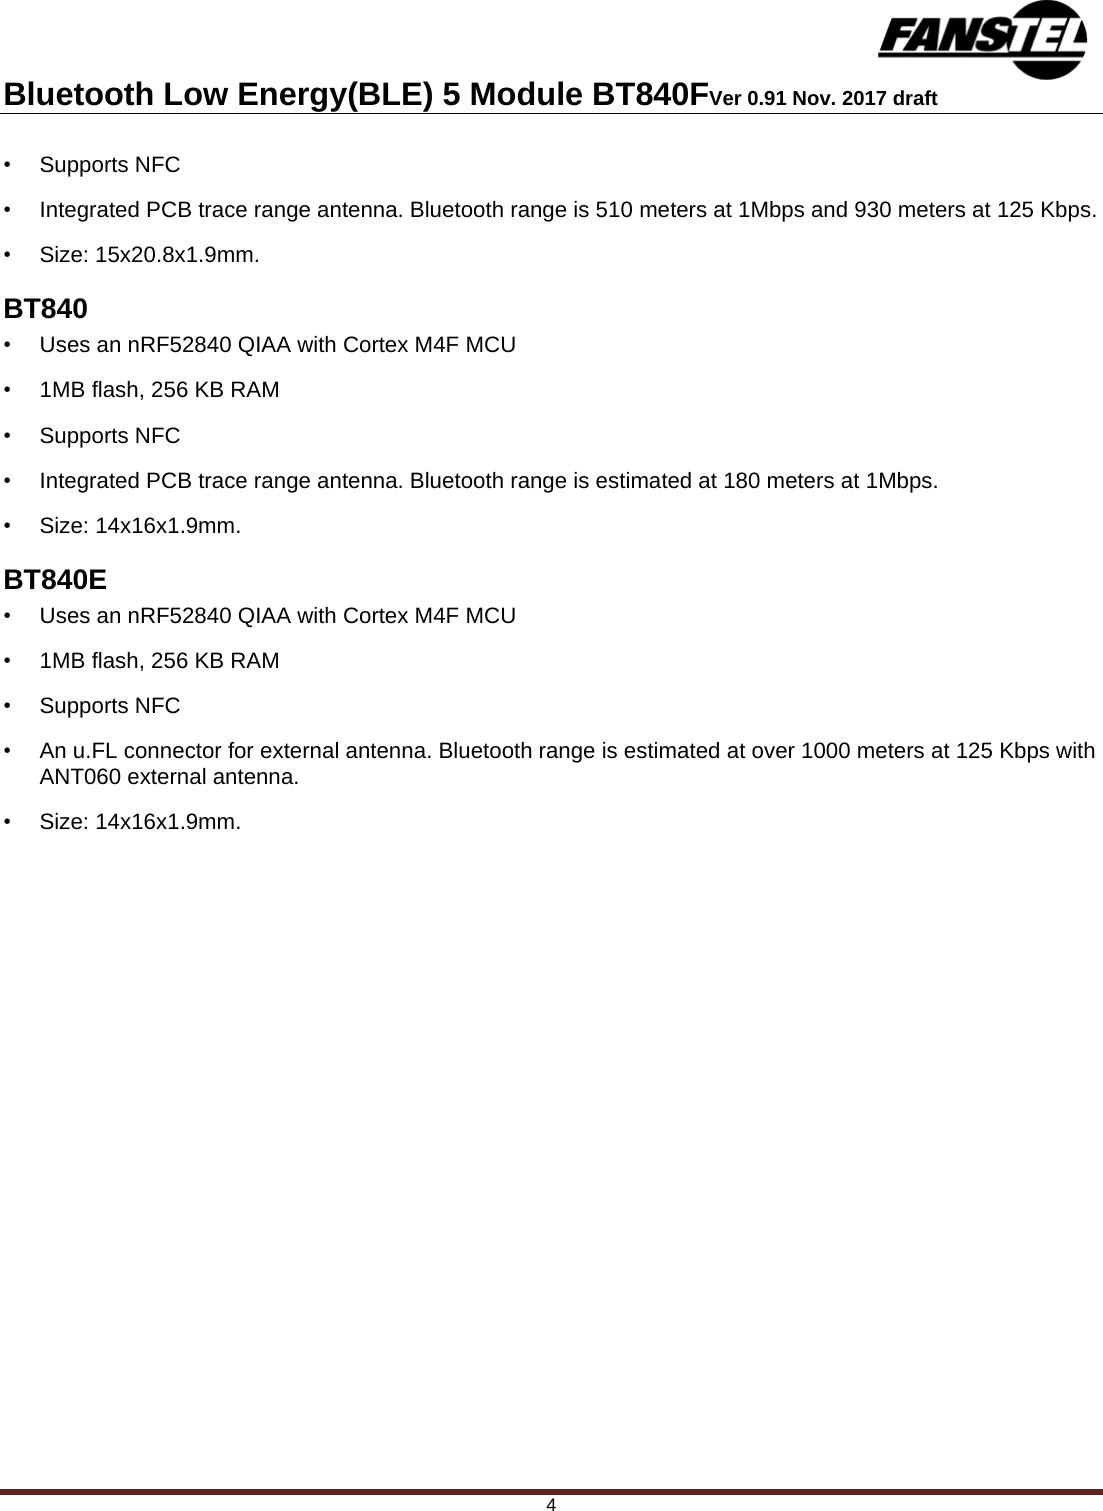 Fanstel Taipei BT840 Bluetooth 5 0 Module User Manual